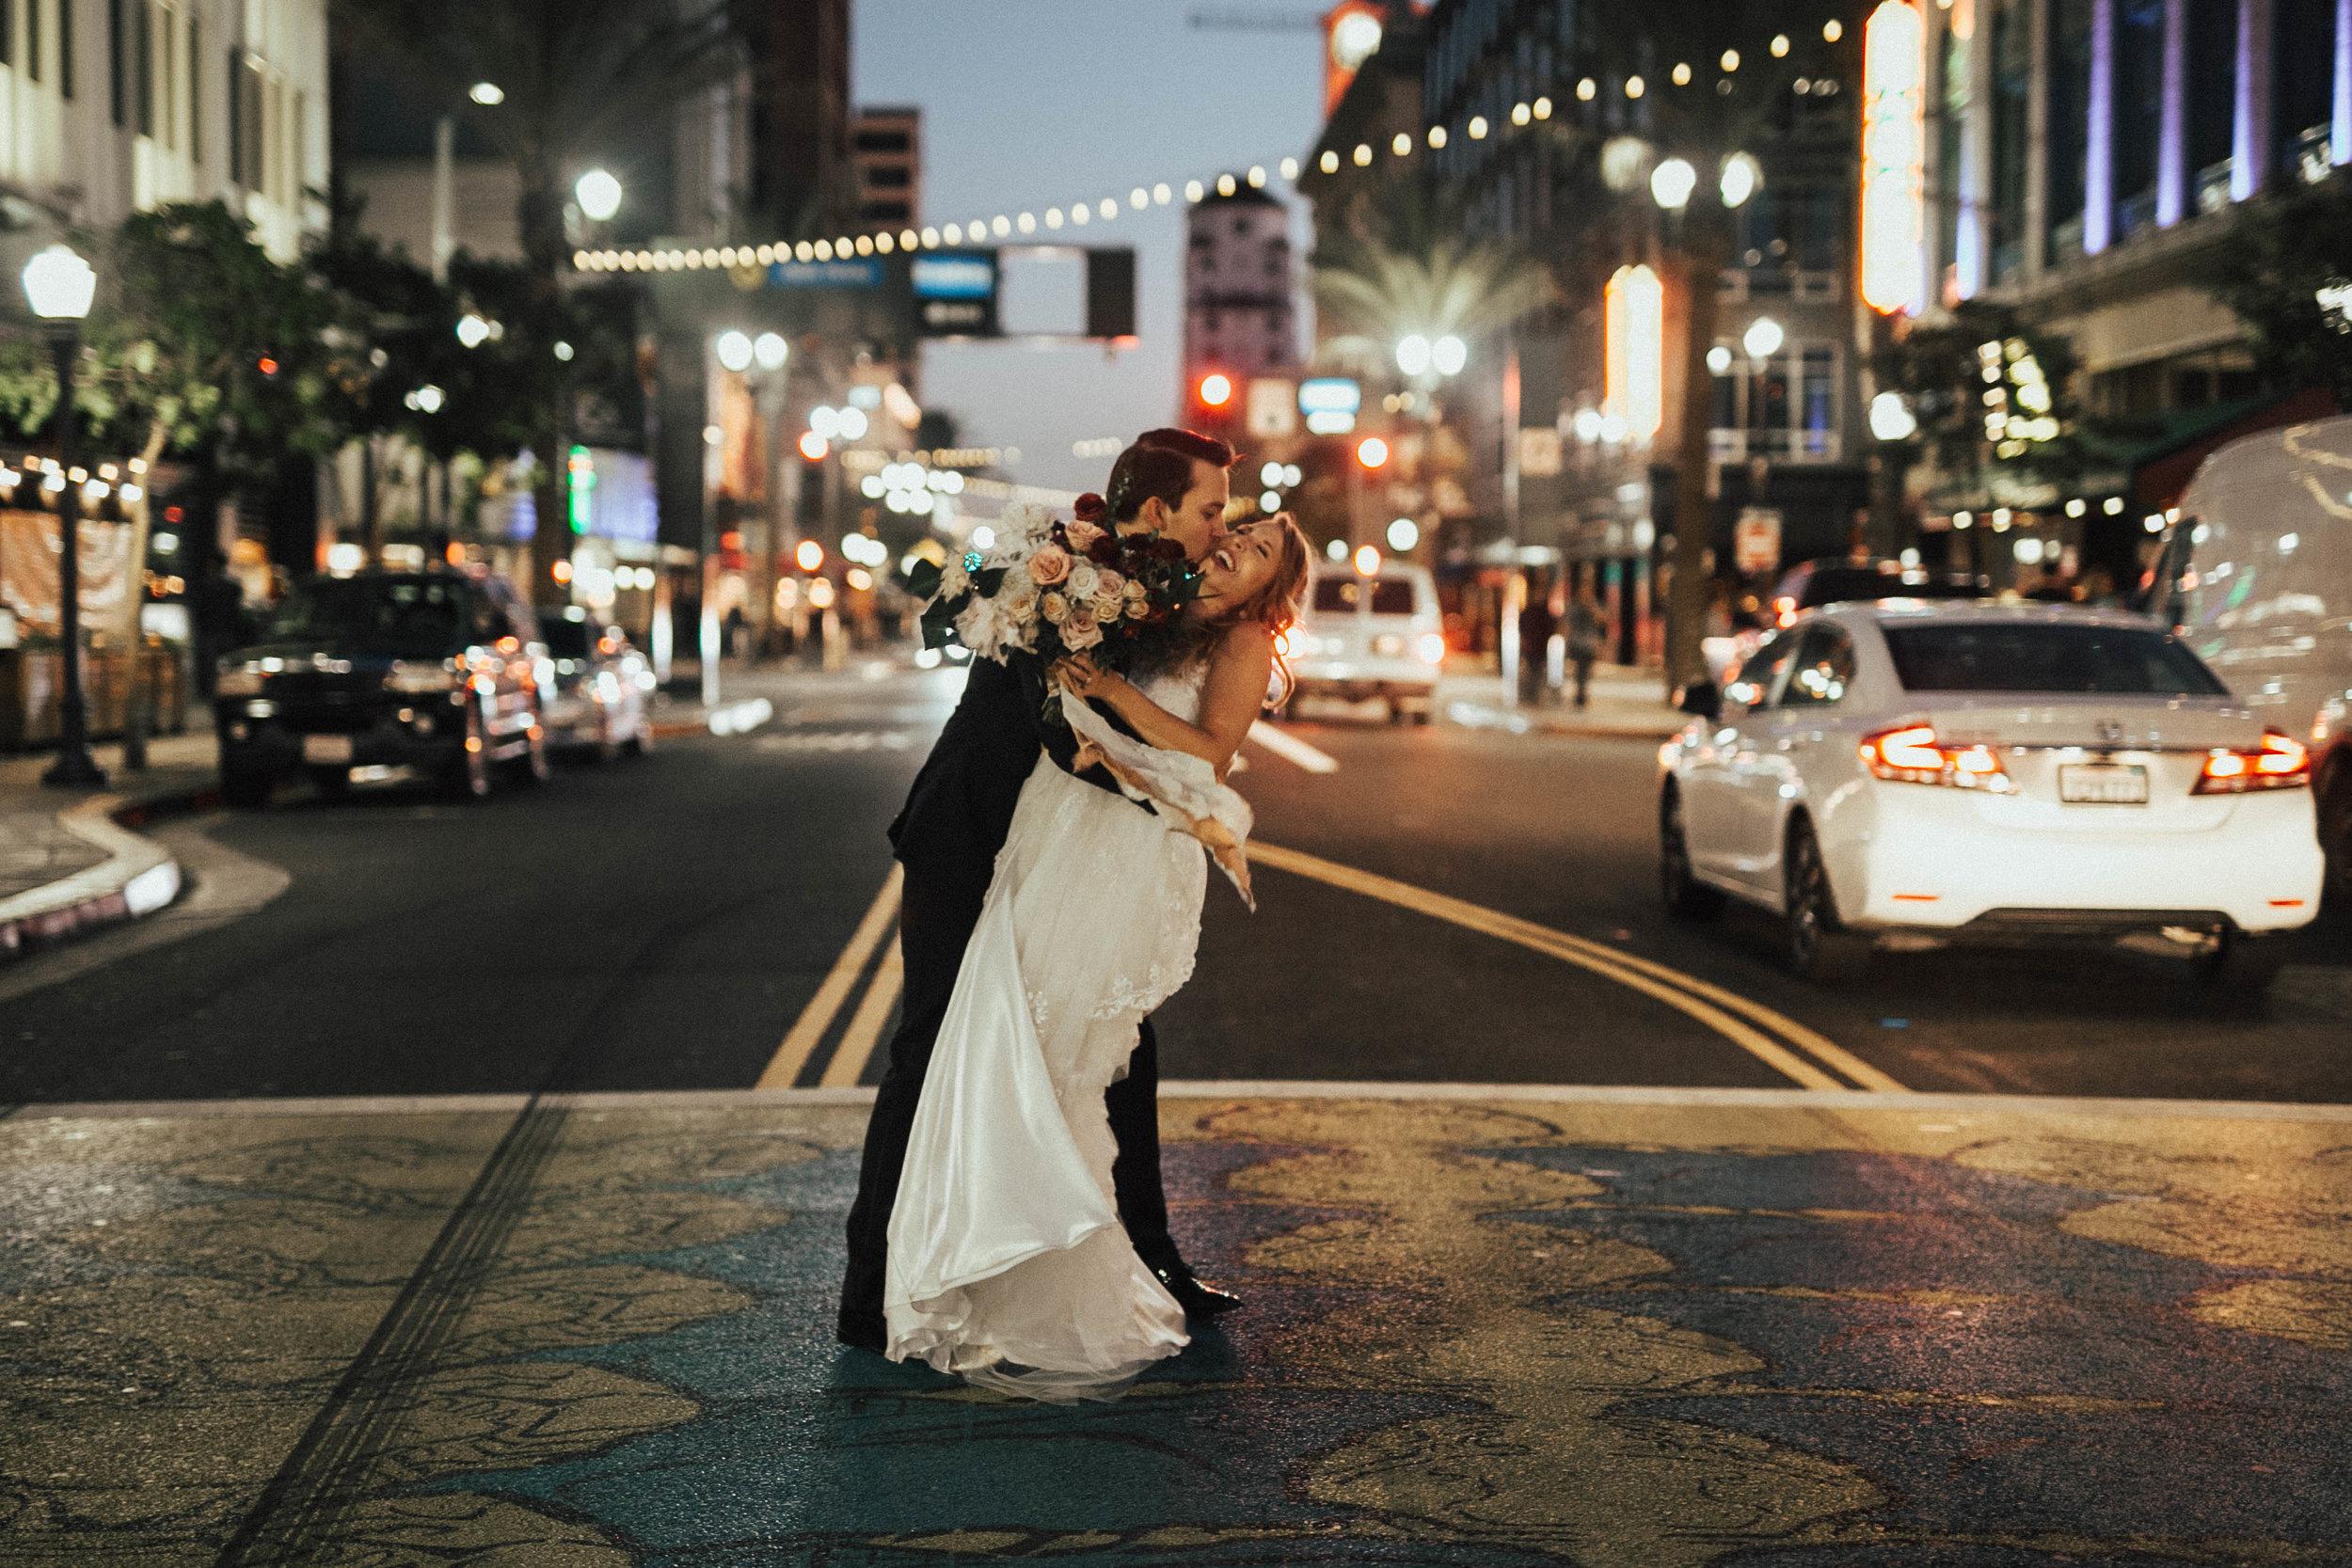 lauren & alex - The Loft on Pine Wedding